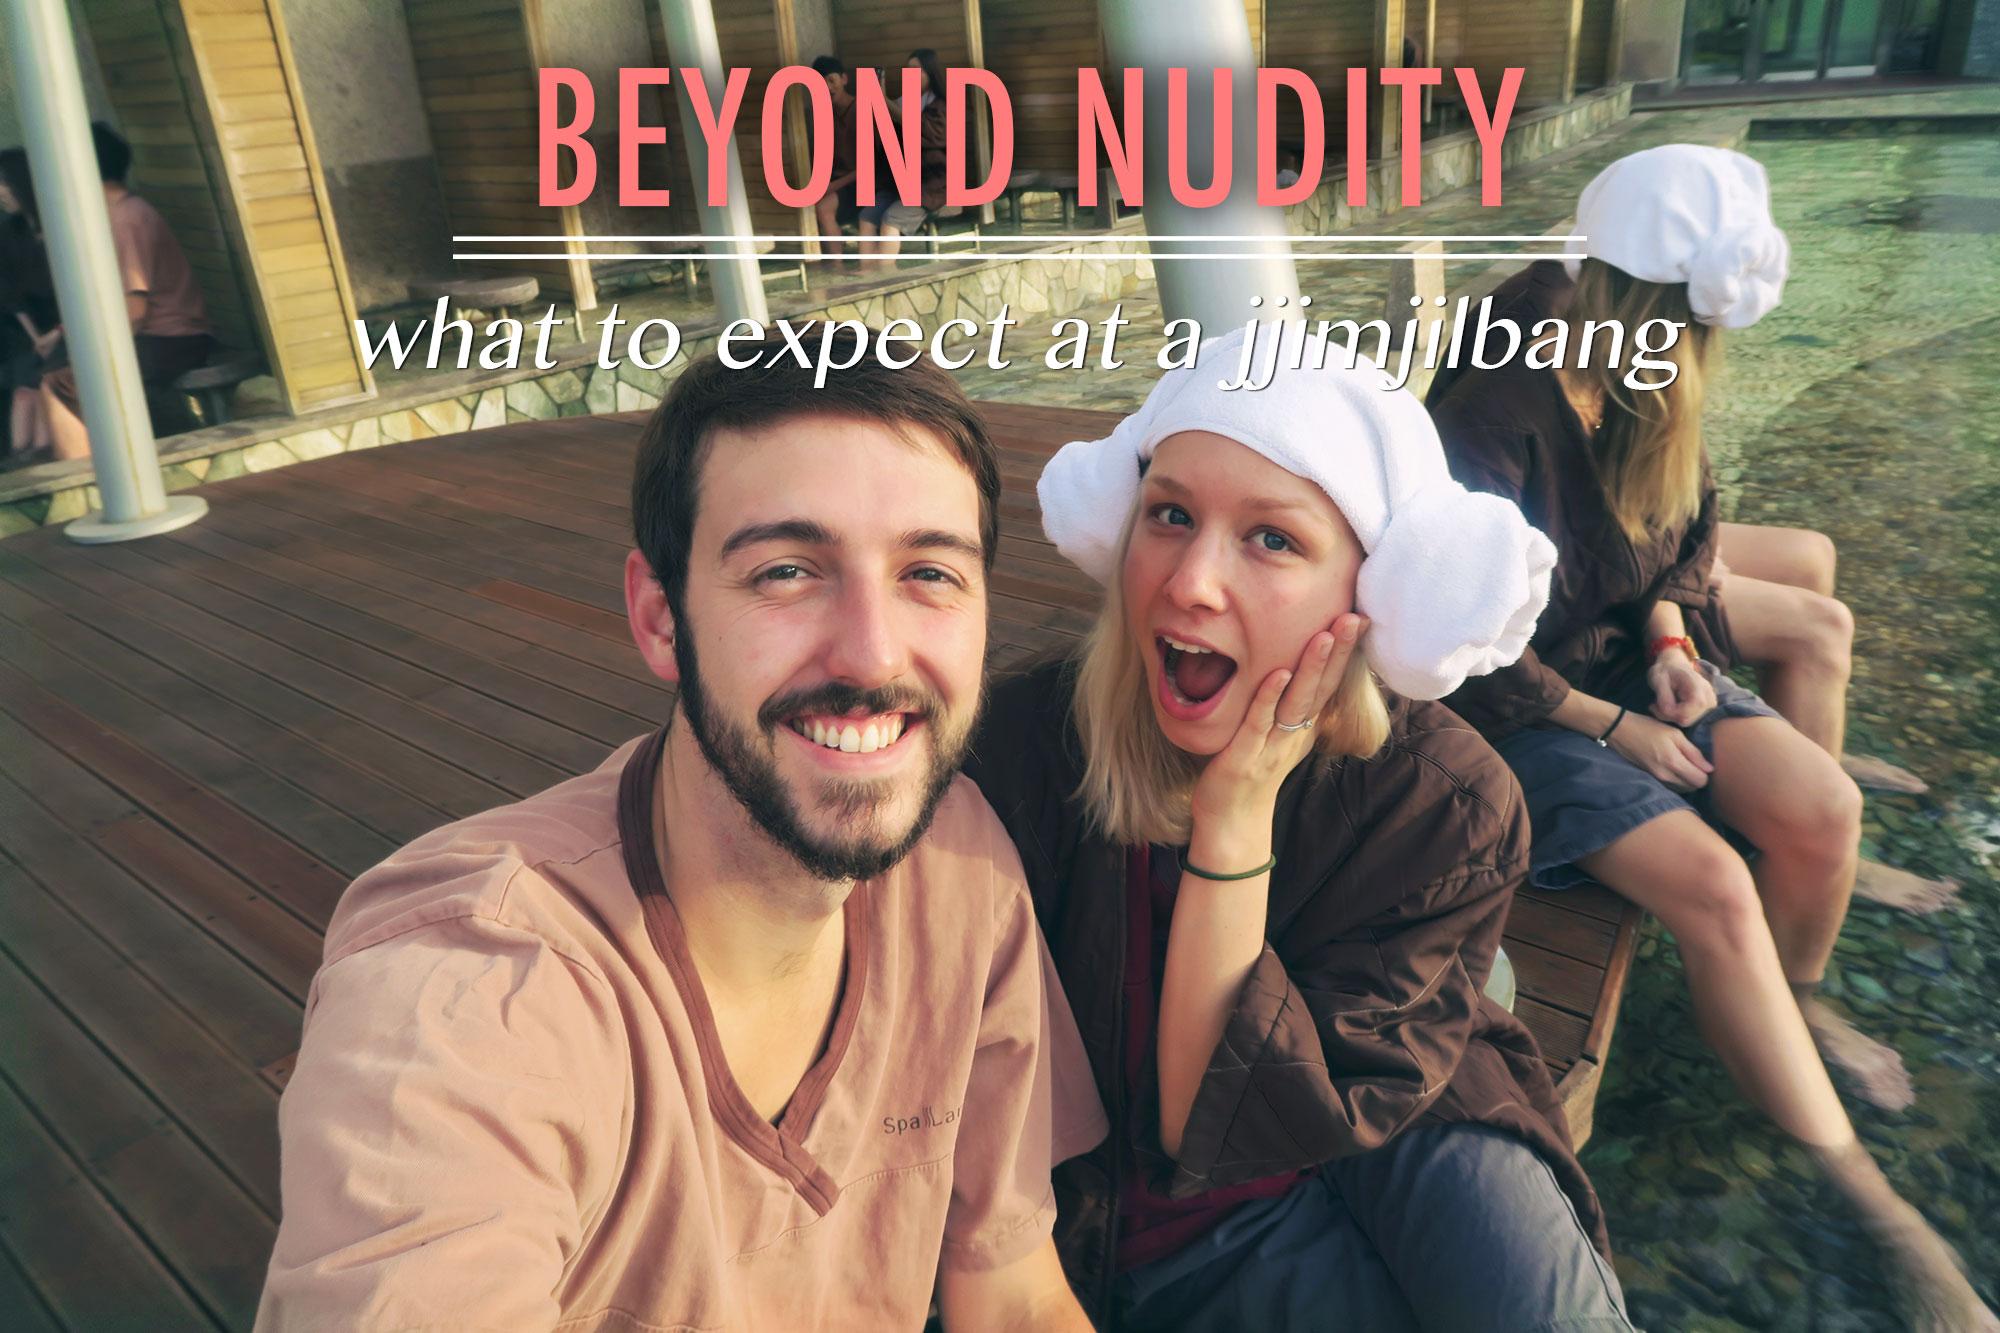 Savannah and naked coeds